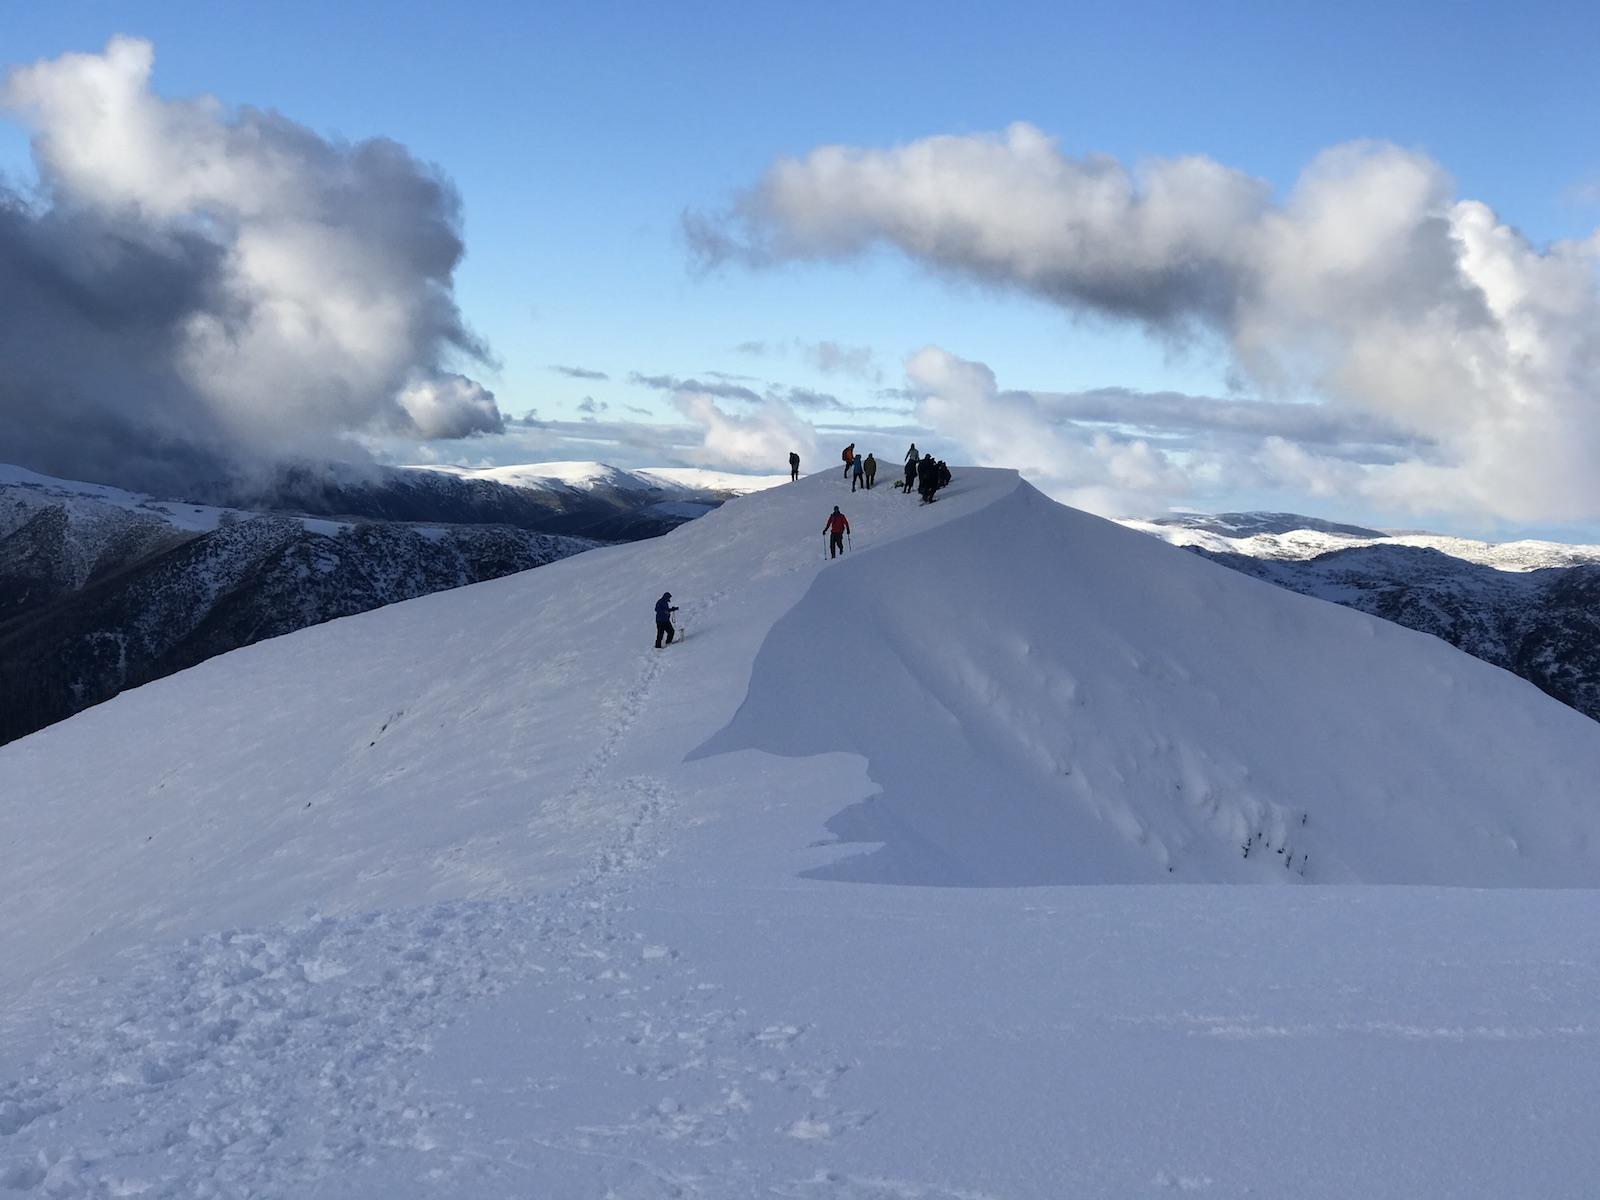 Mount Feathertop - Winter